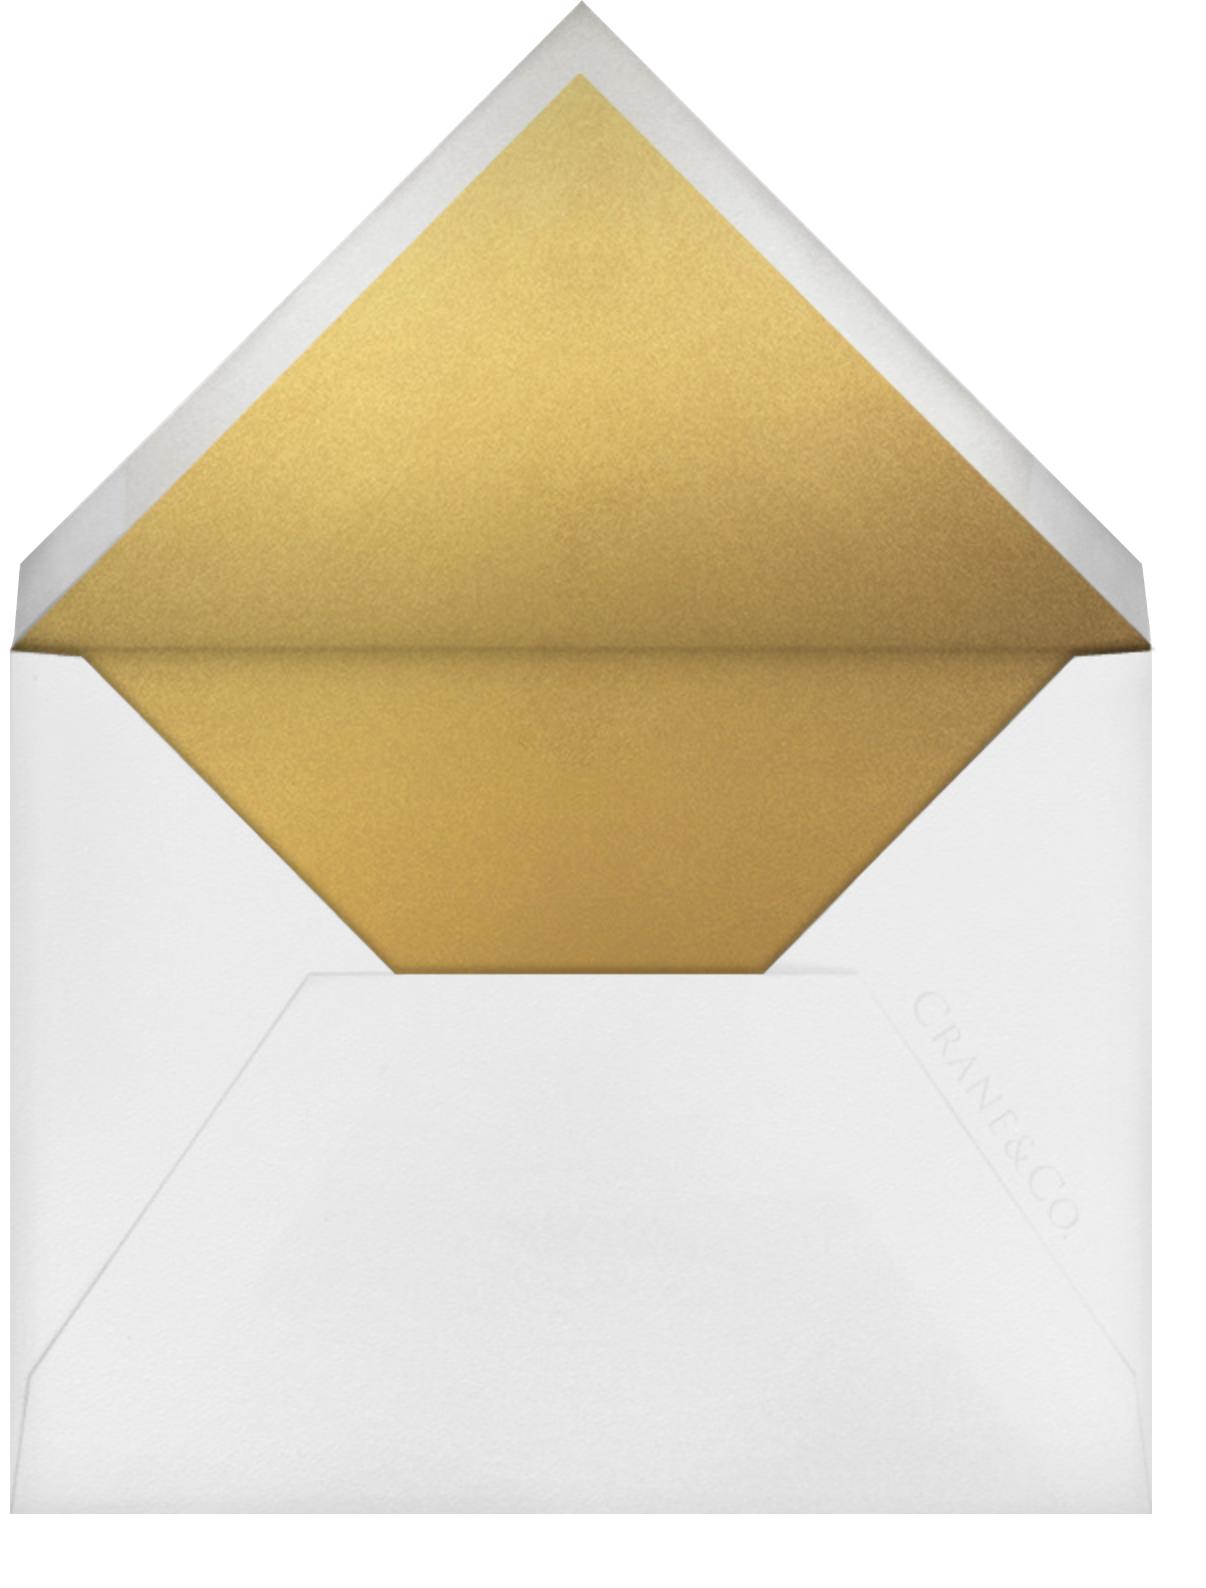 Jubilee I (Save the Date) - Medium Gold - Kelly Wearstler - Gold and metallic - envelope back